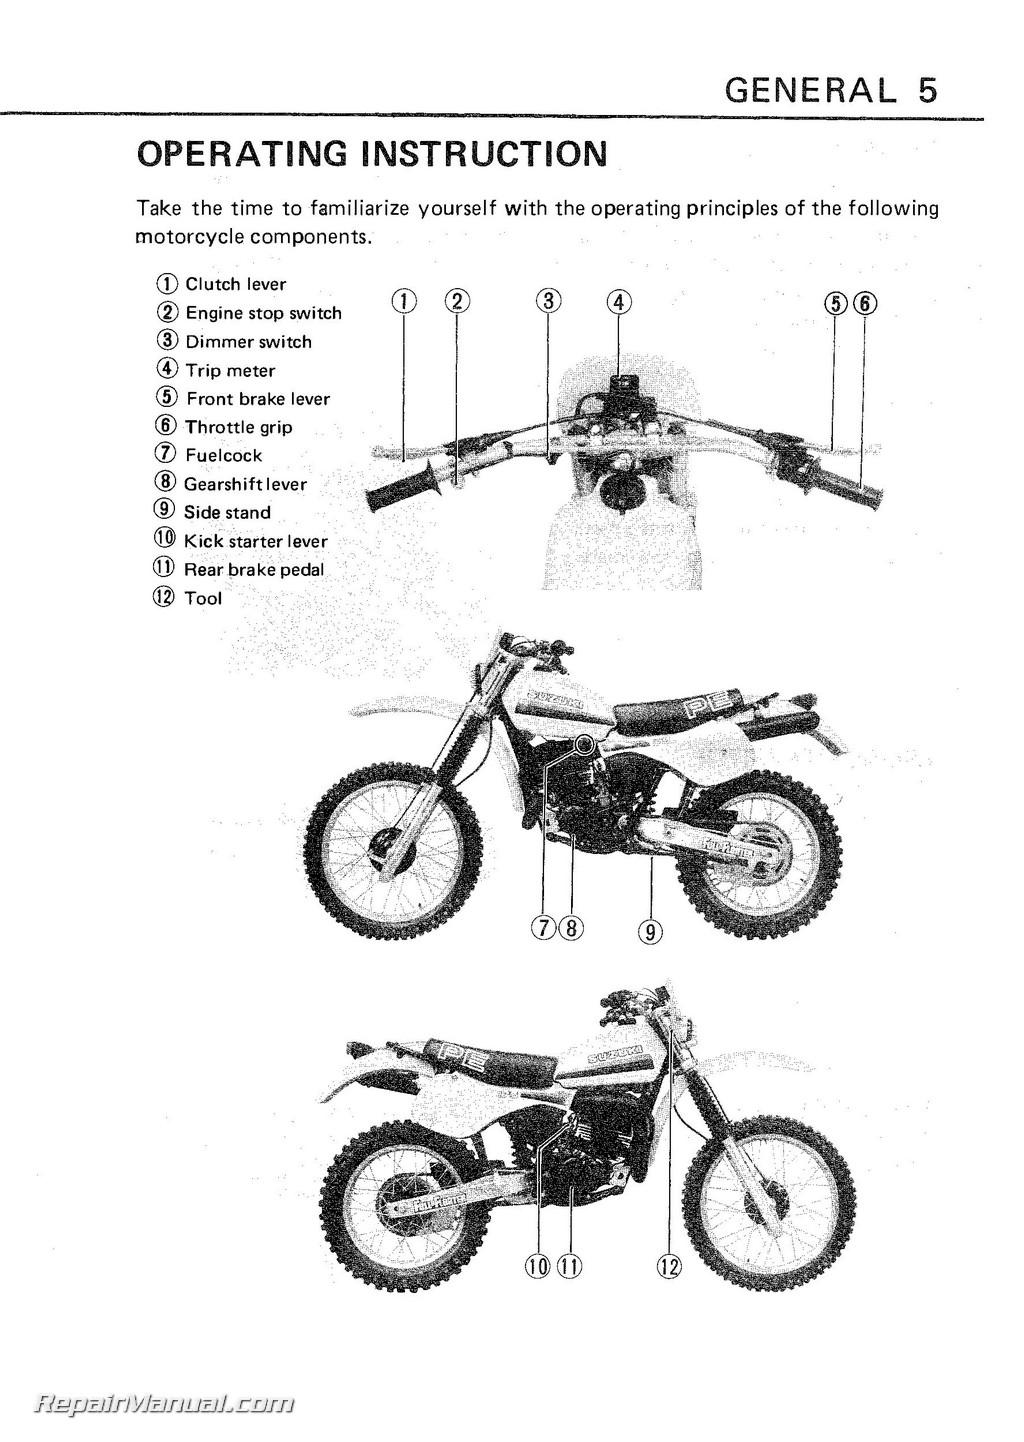 1982 1984 suzuki pe175 motorcycle owners manual rh repairmanual com 1980 Suzuki Pe 175 suzuki pe 175 workshop manual